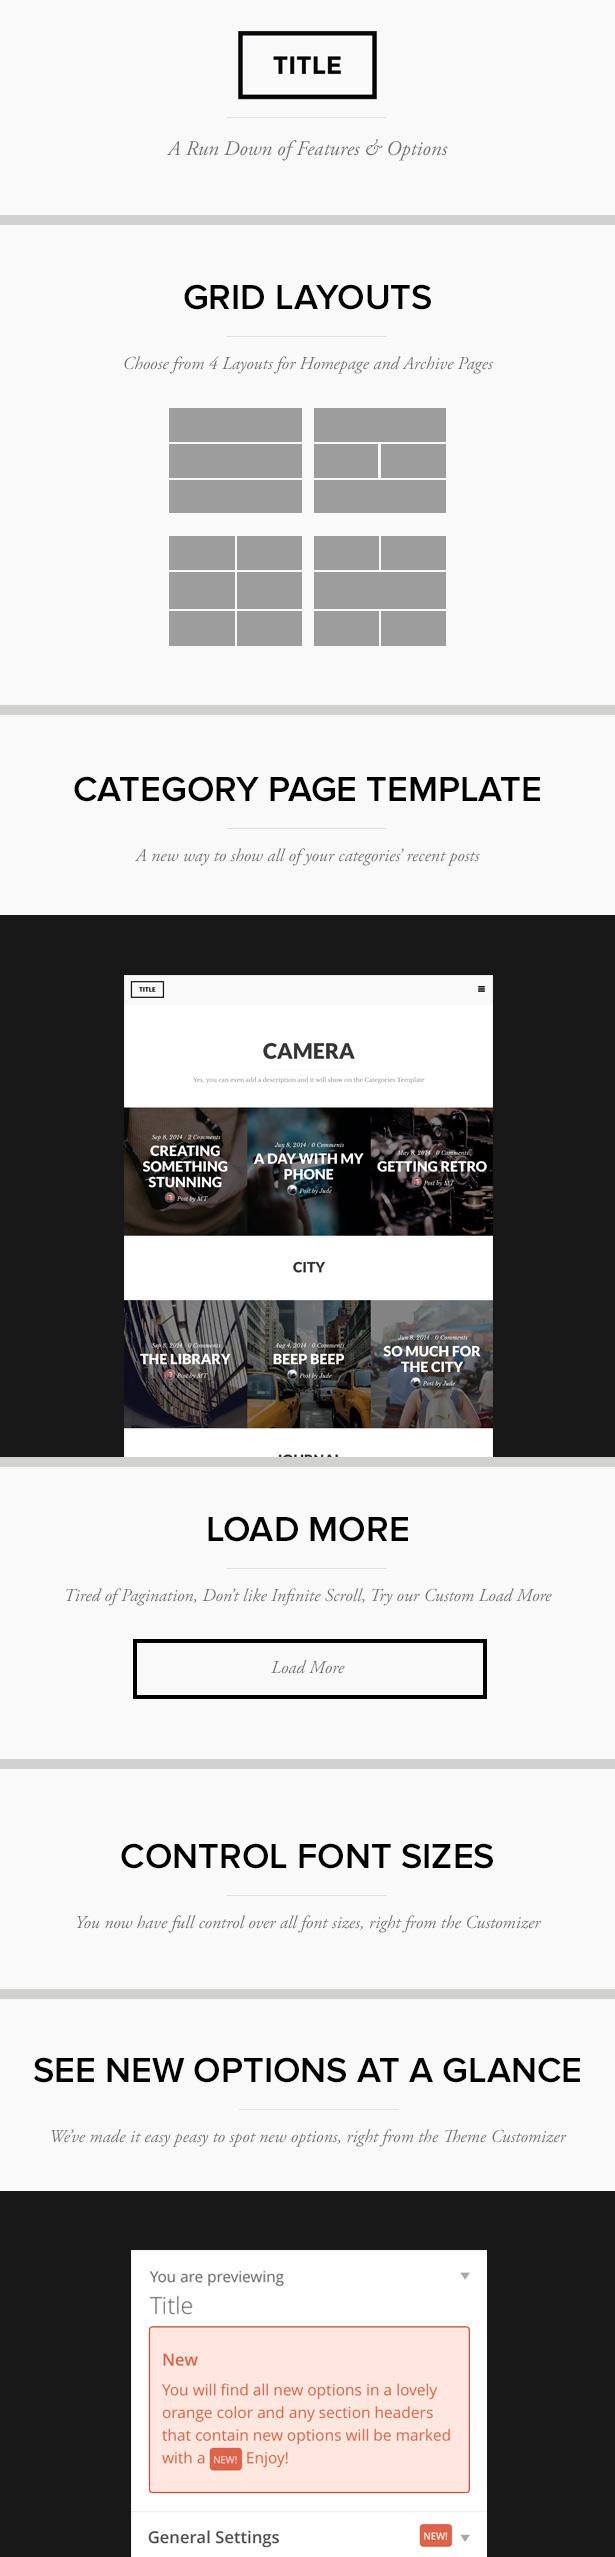 WordPress theme Title: Create Something Stunning (Personal)